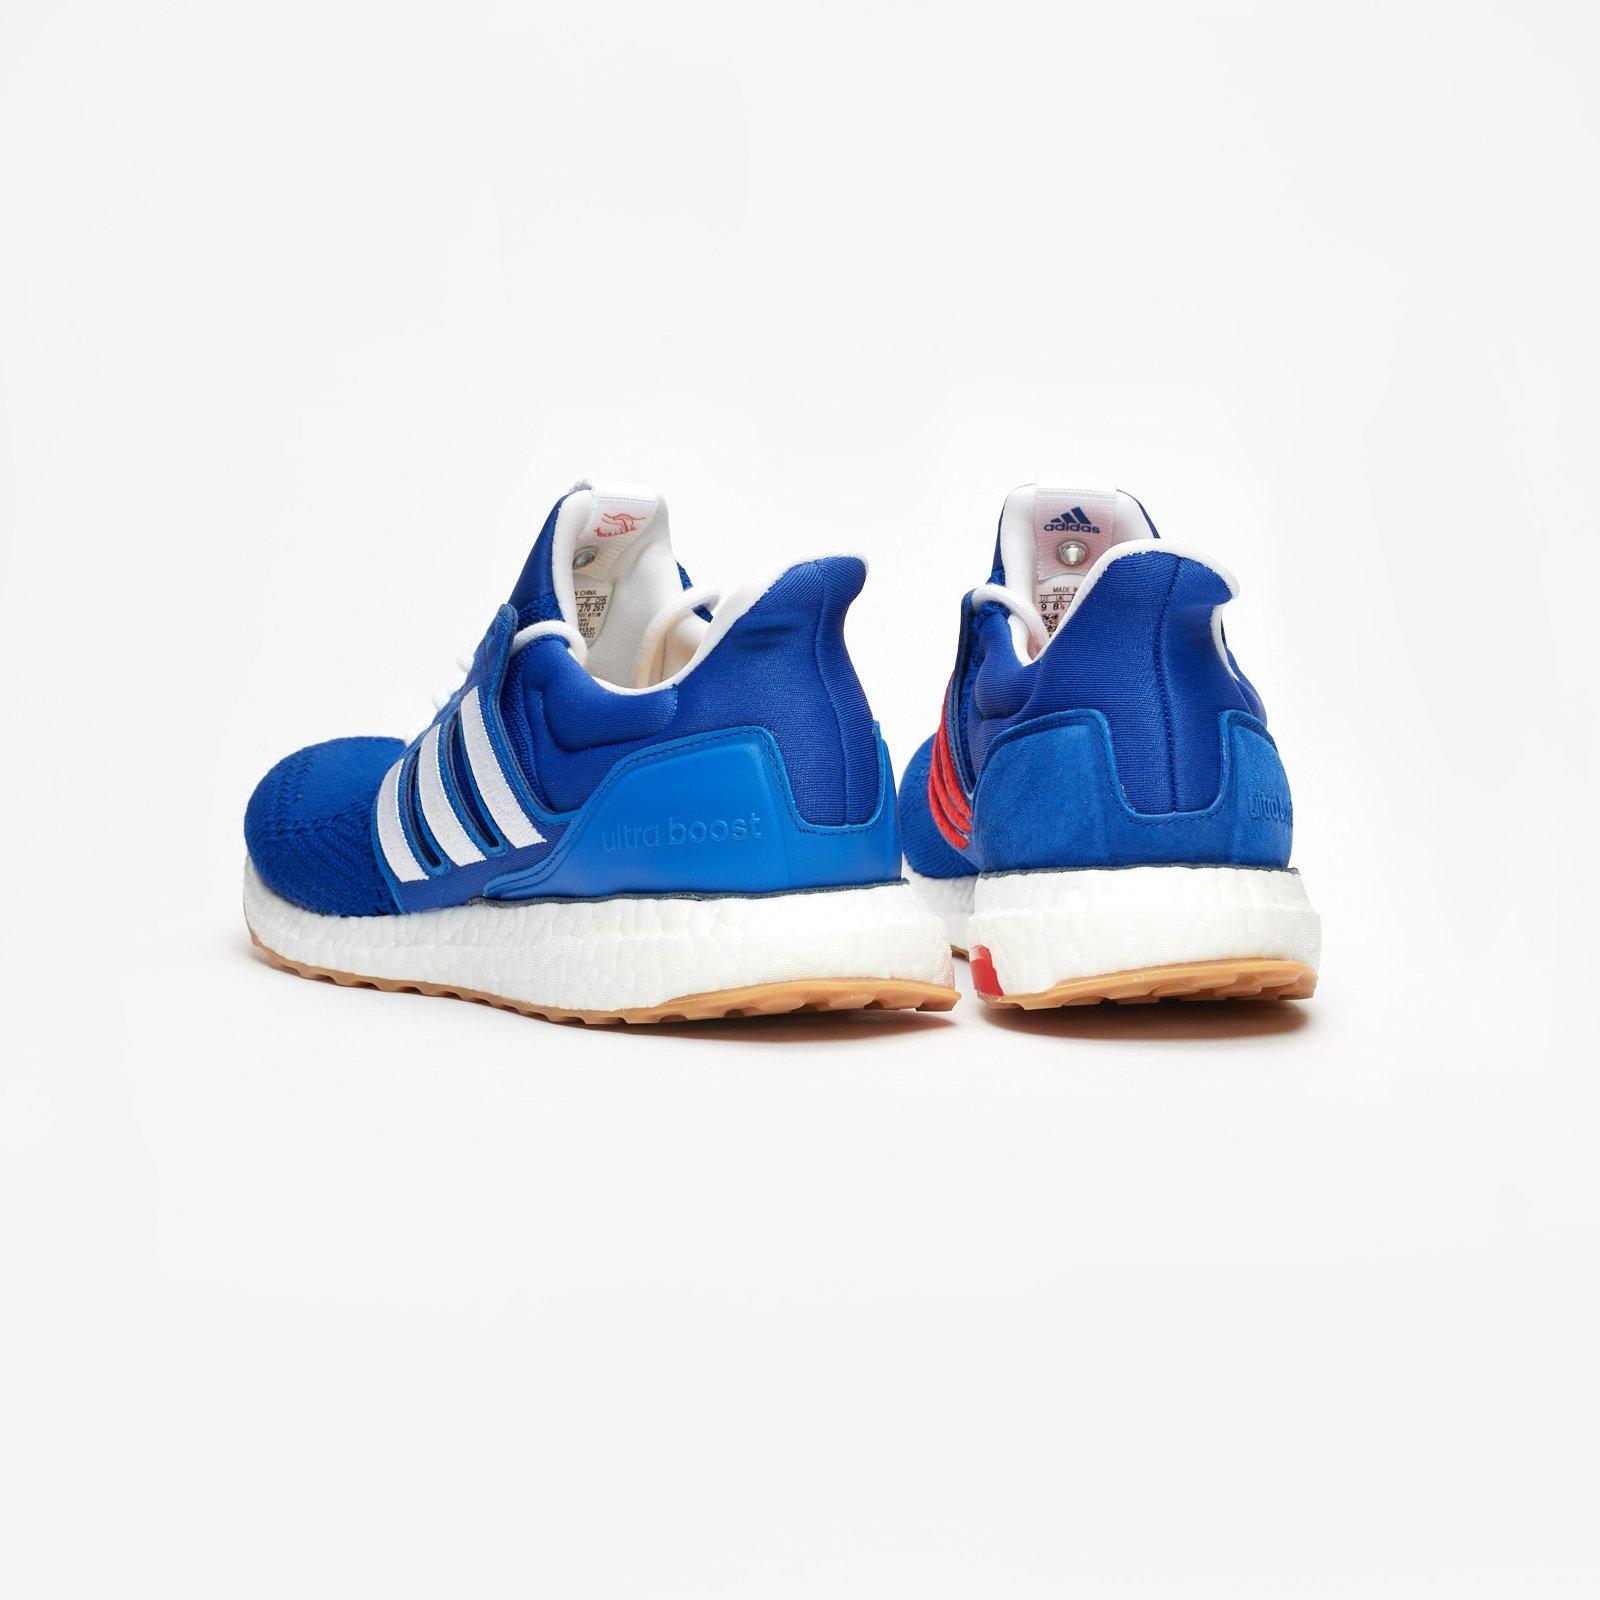 503591245 adidas UltraBOOST E.G - Bc0949 - Sneakersnstuff